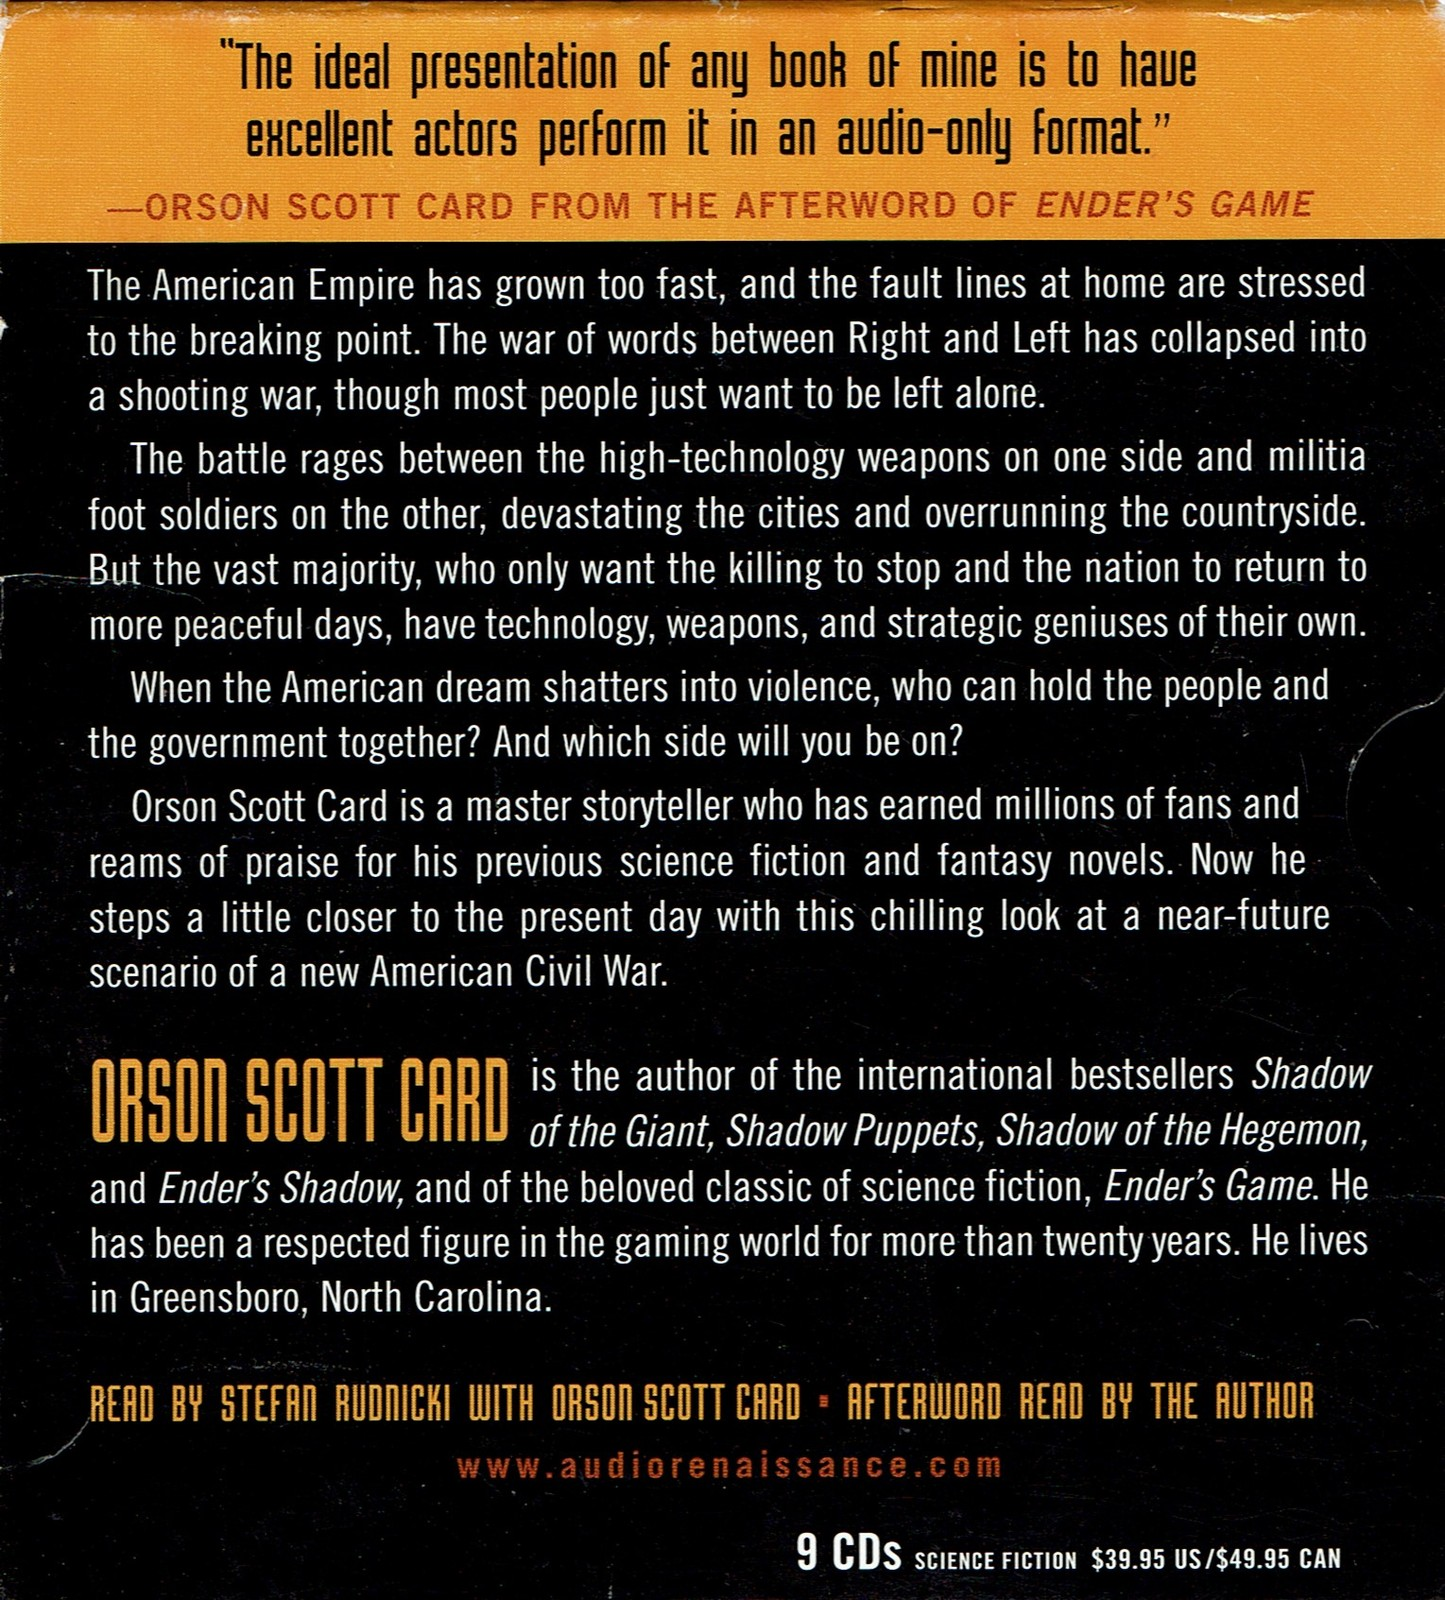 Empire, by Orson Scott Card, Audio CD, Audiobook, Unabridged 9 CD's